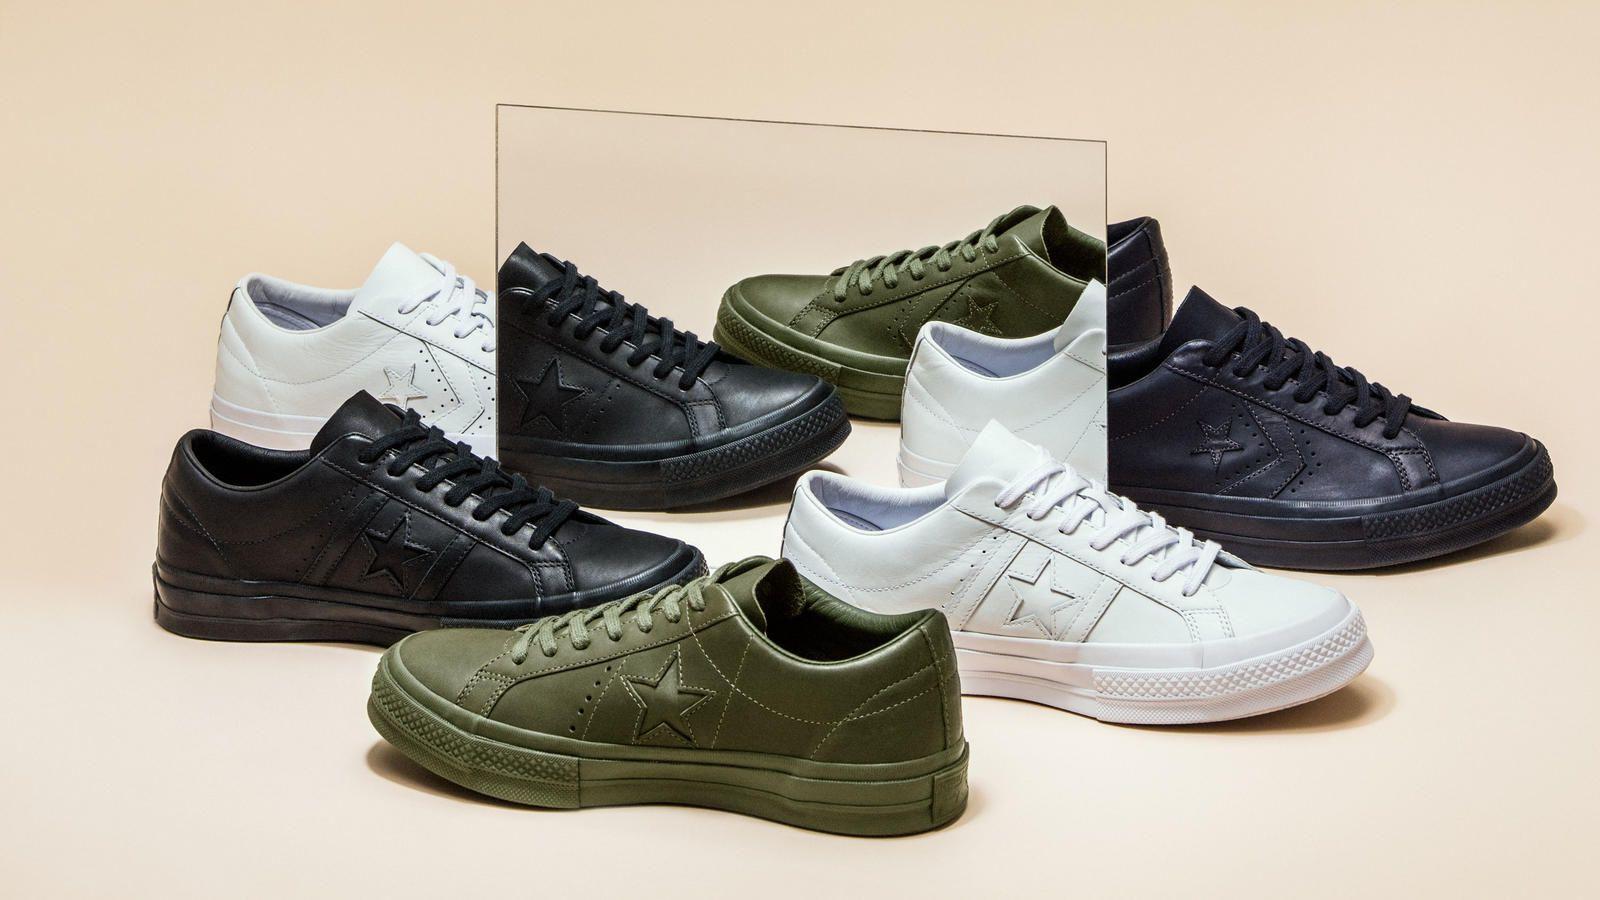 LTT MID LEATHER - CHAUSSURES - Sneakers & Tennis montantesConverse M4sZr